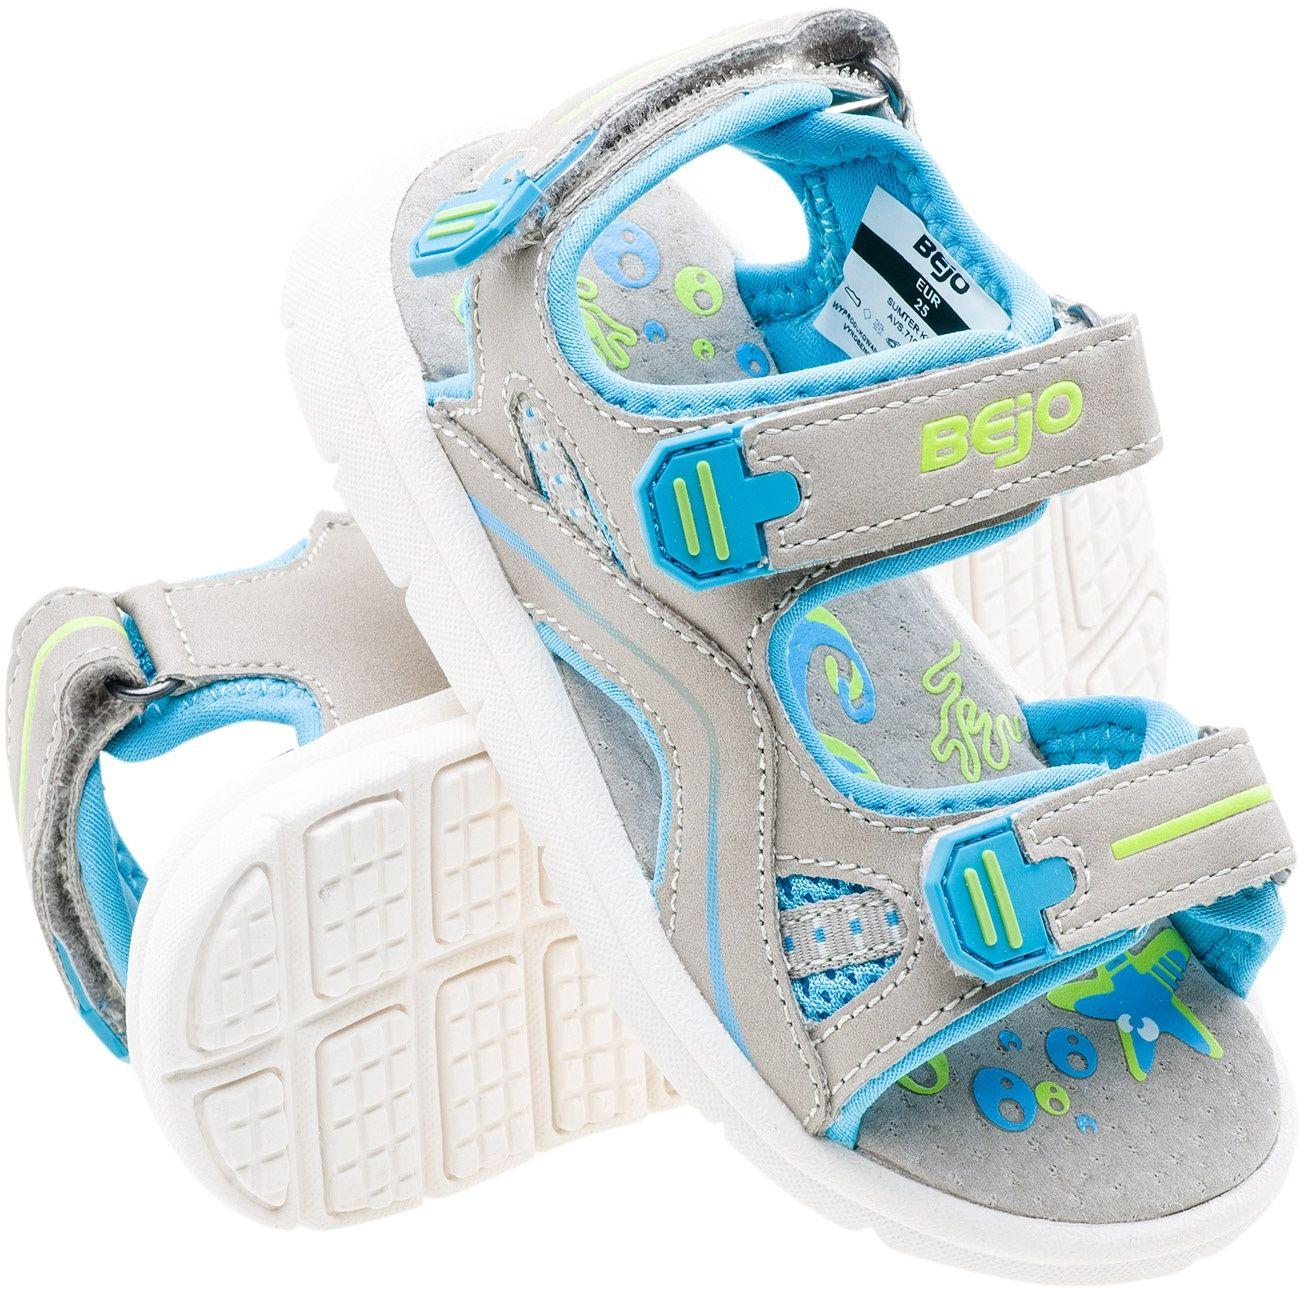 BEJO Sandaly dzieciece Sumter Kids Grey/Blue/Light Lime r. 22 4013886